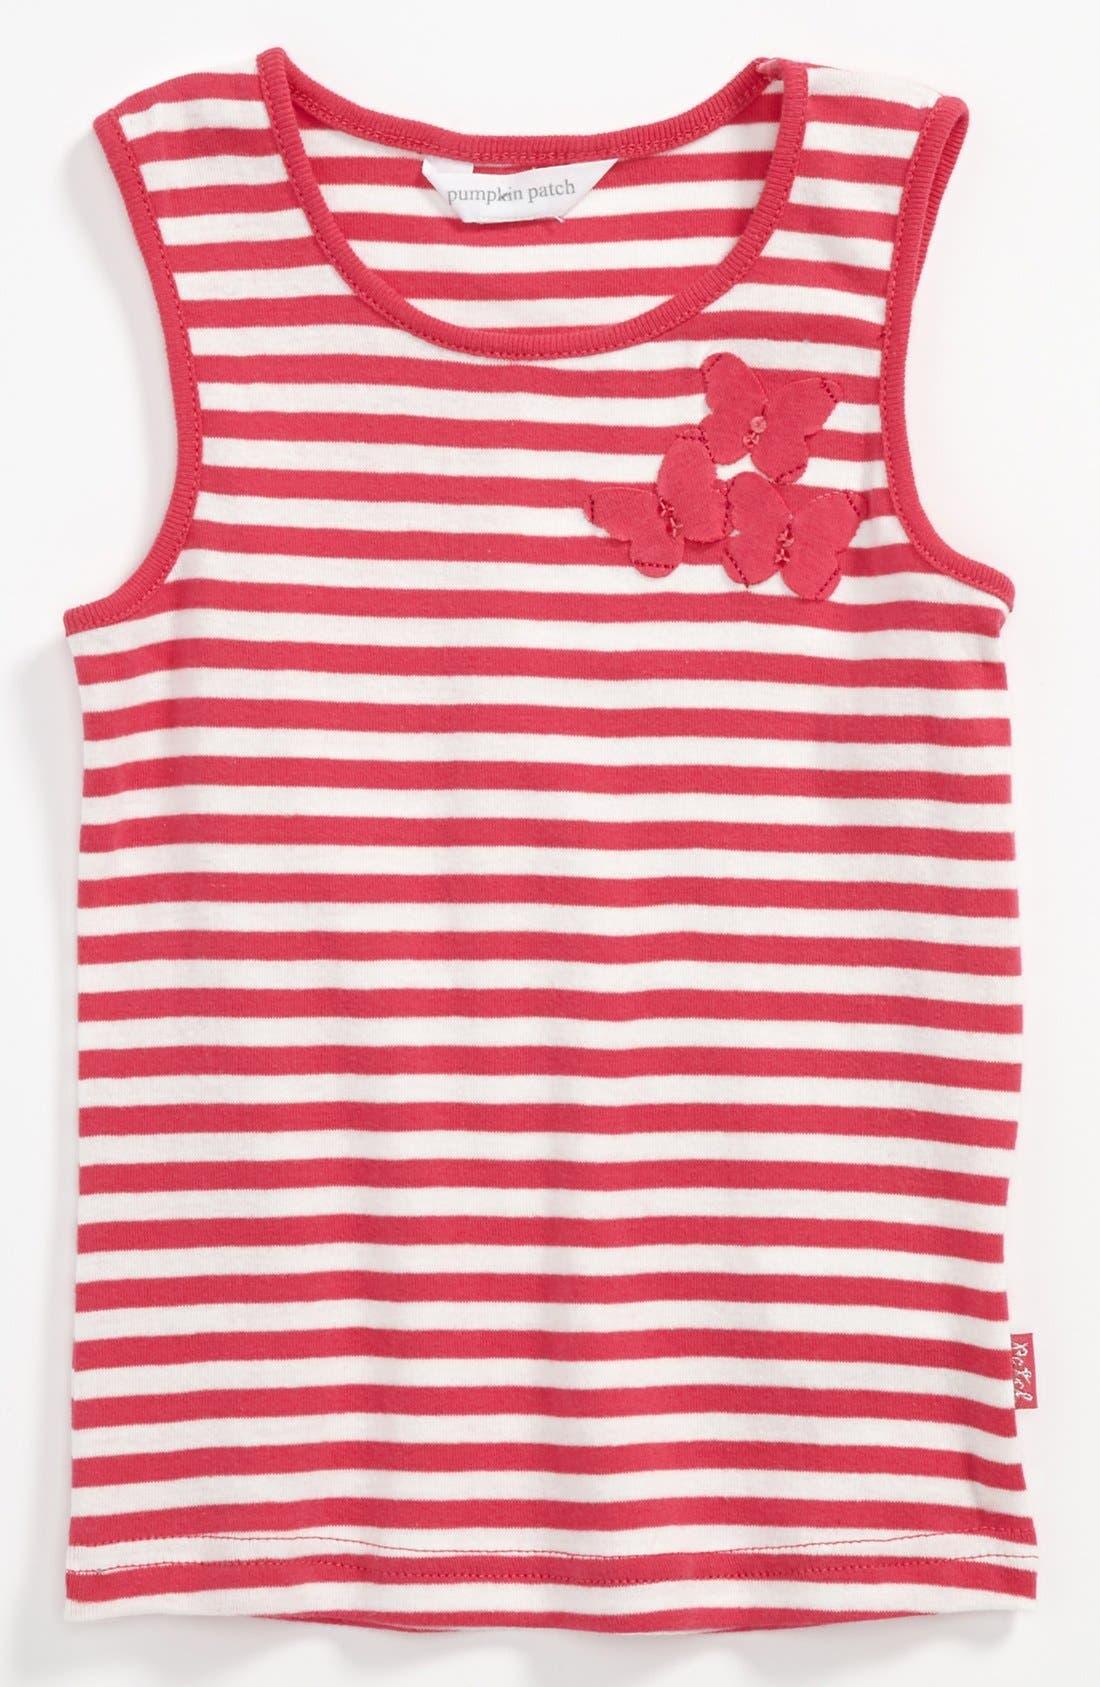 Main Image - Pumpkin Patch Stripe Tank Top (Toddler)